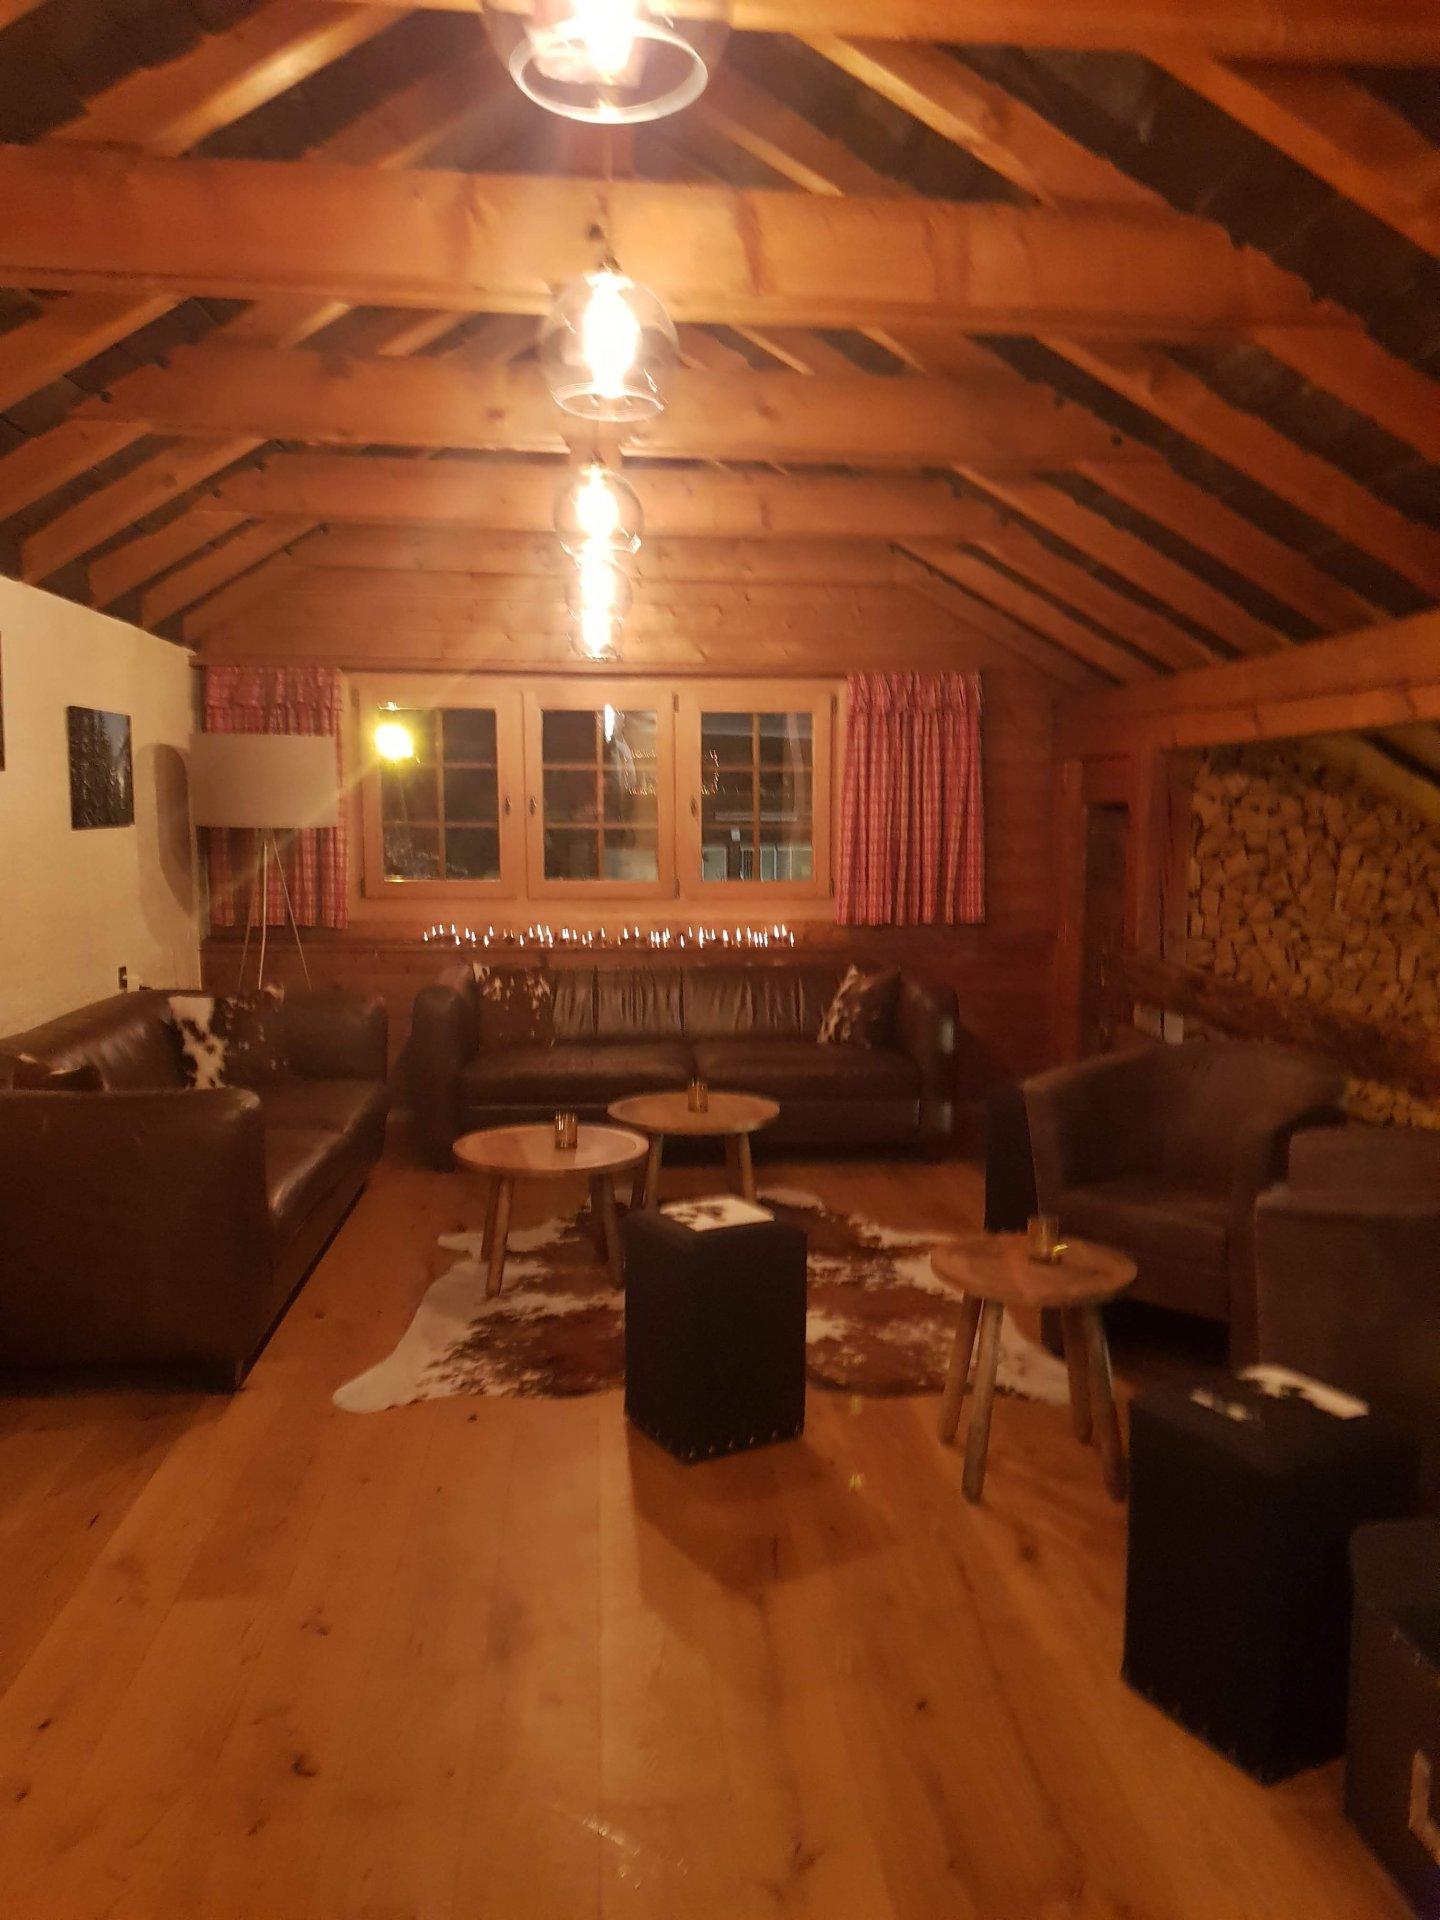 A vendre -  Magnifique hôtel atypique / 5 chambres + restaurant.